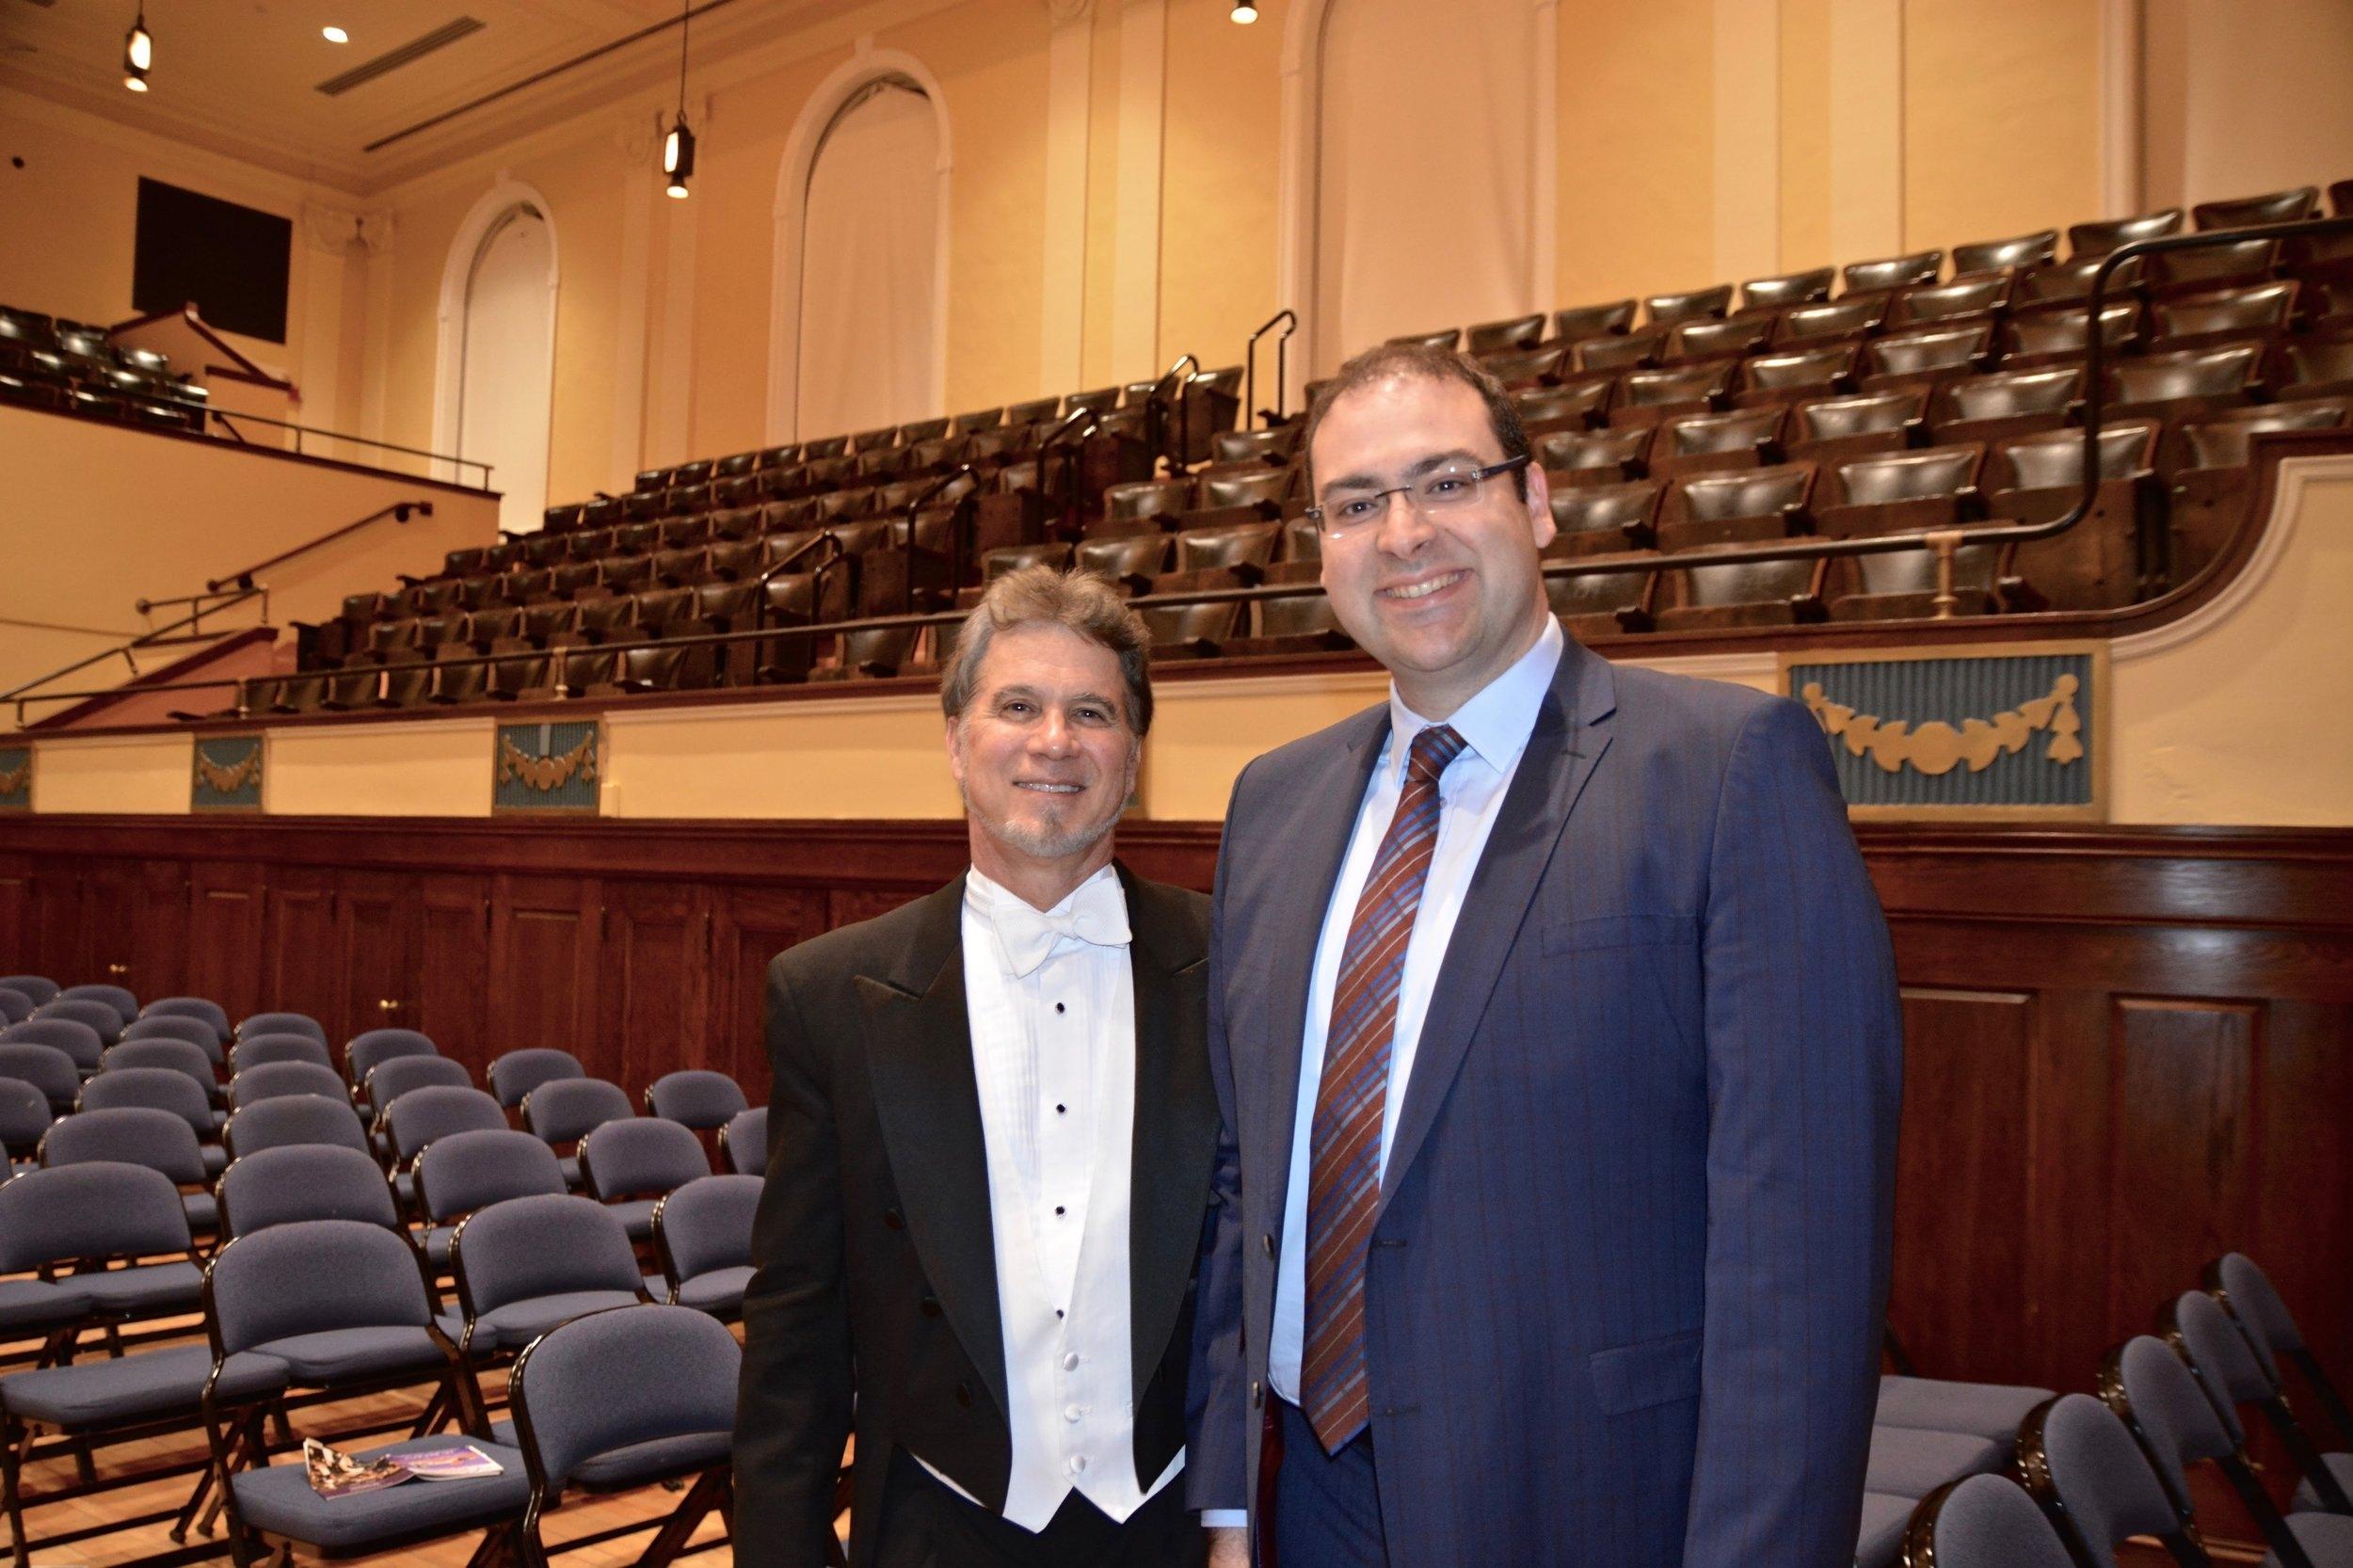 Conductor Jonathan McPhee and Composer Baris Perker